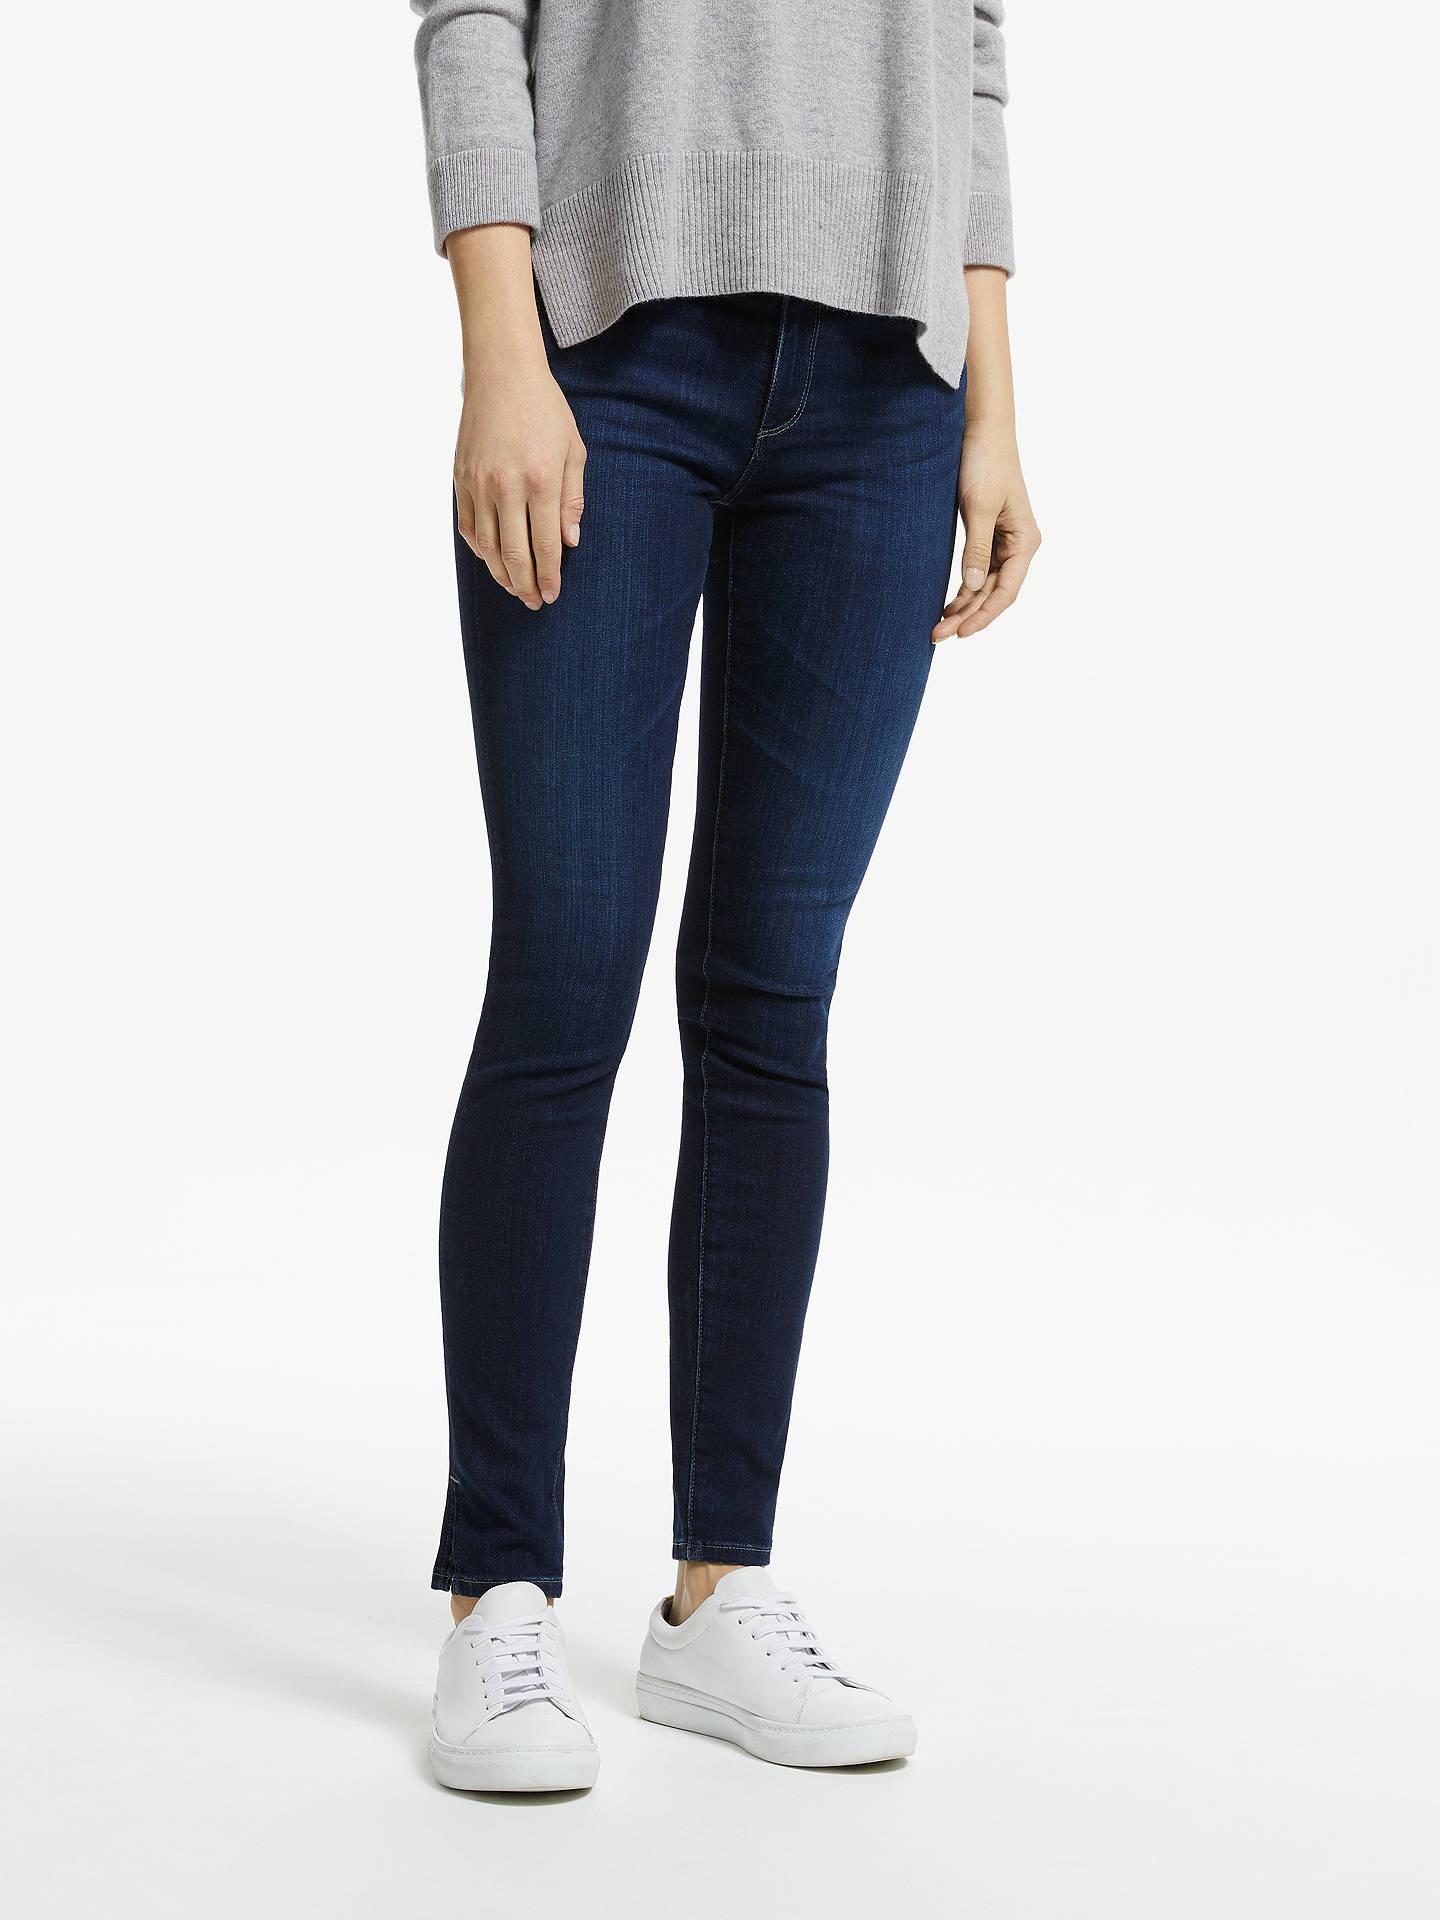 1419eb66da95 Buy AG The Leggings Super Skinny Jeans, Concord, 26 Online at johnlewis.com  ...